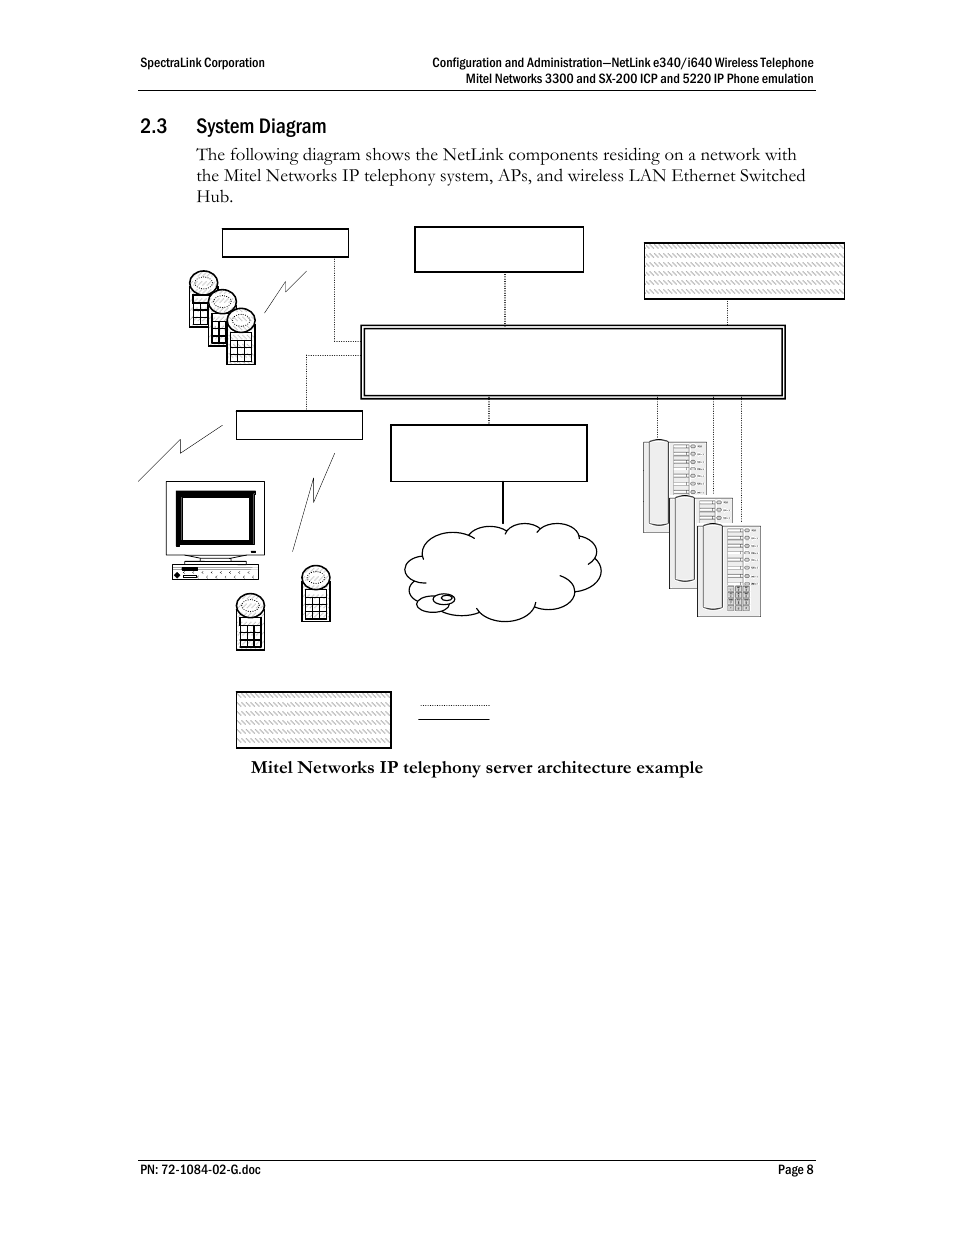 3 System Diagram Mitel Icp Platform Tftp Server Polycom Wireless Network Architecture Networks 3300 User Manual Page 8 60